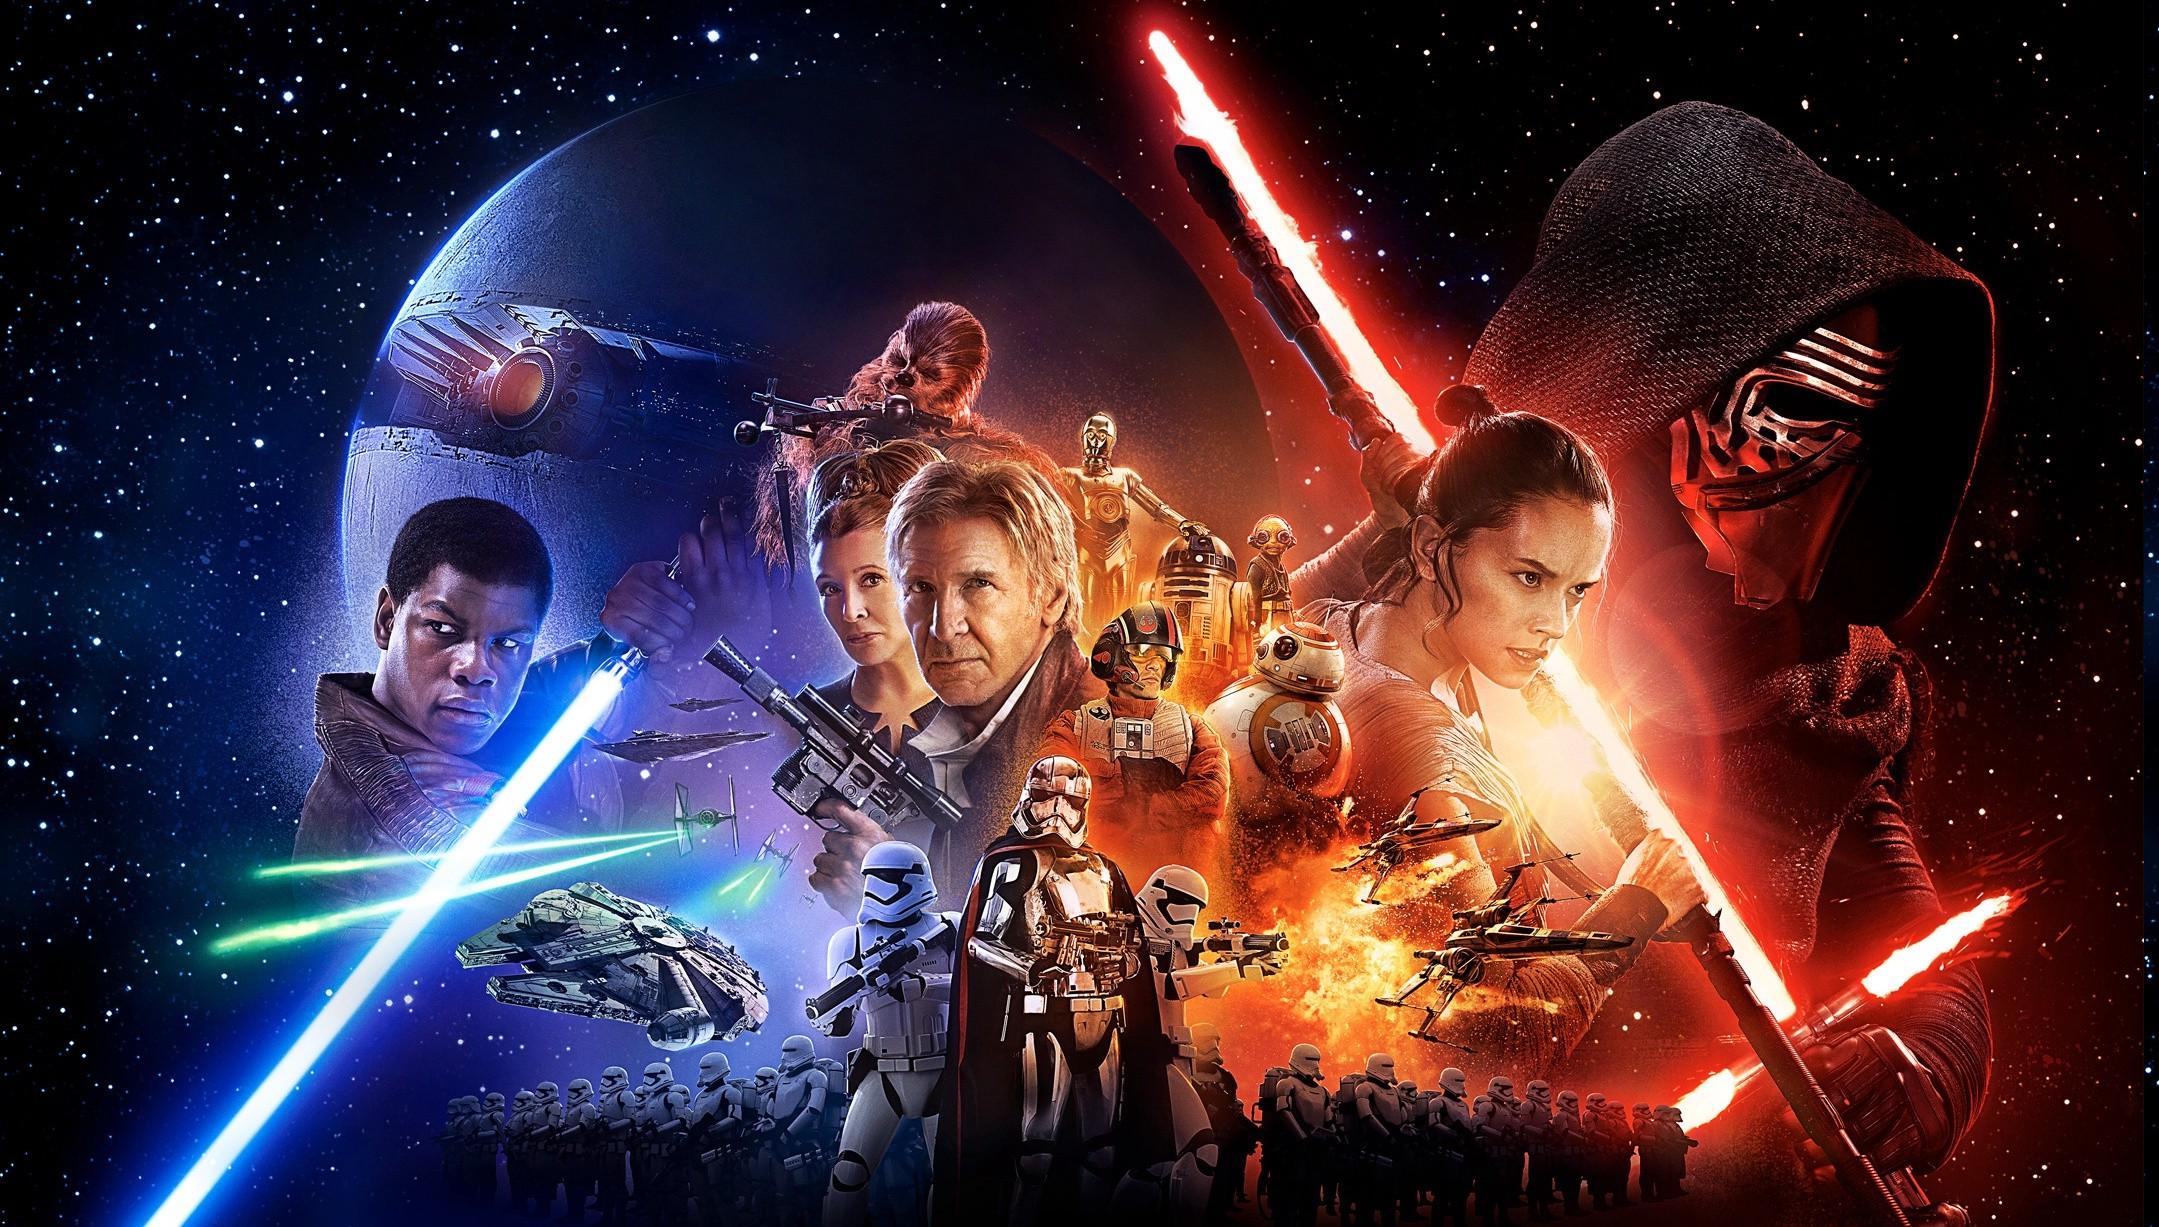 Wallpaper 2159x1227 Px Bb 8 C 3po Captain Phasma Chewbacca Han Solo Jedi Kylo Ren Lightsaber Luke Skywalker Millennium Falcon R2 D2 Sith Star Wars Star Wars Episode Vii The Force